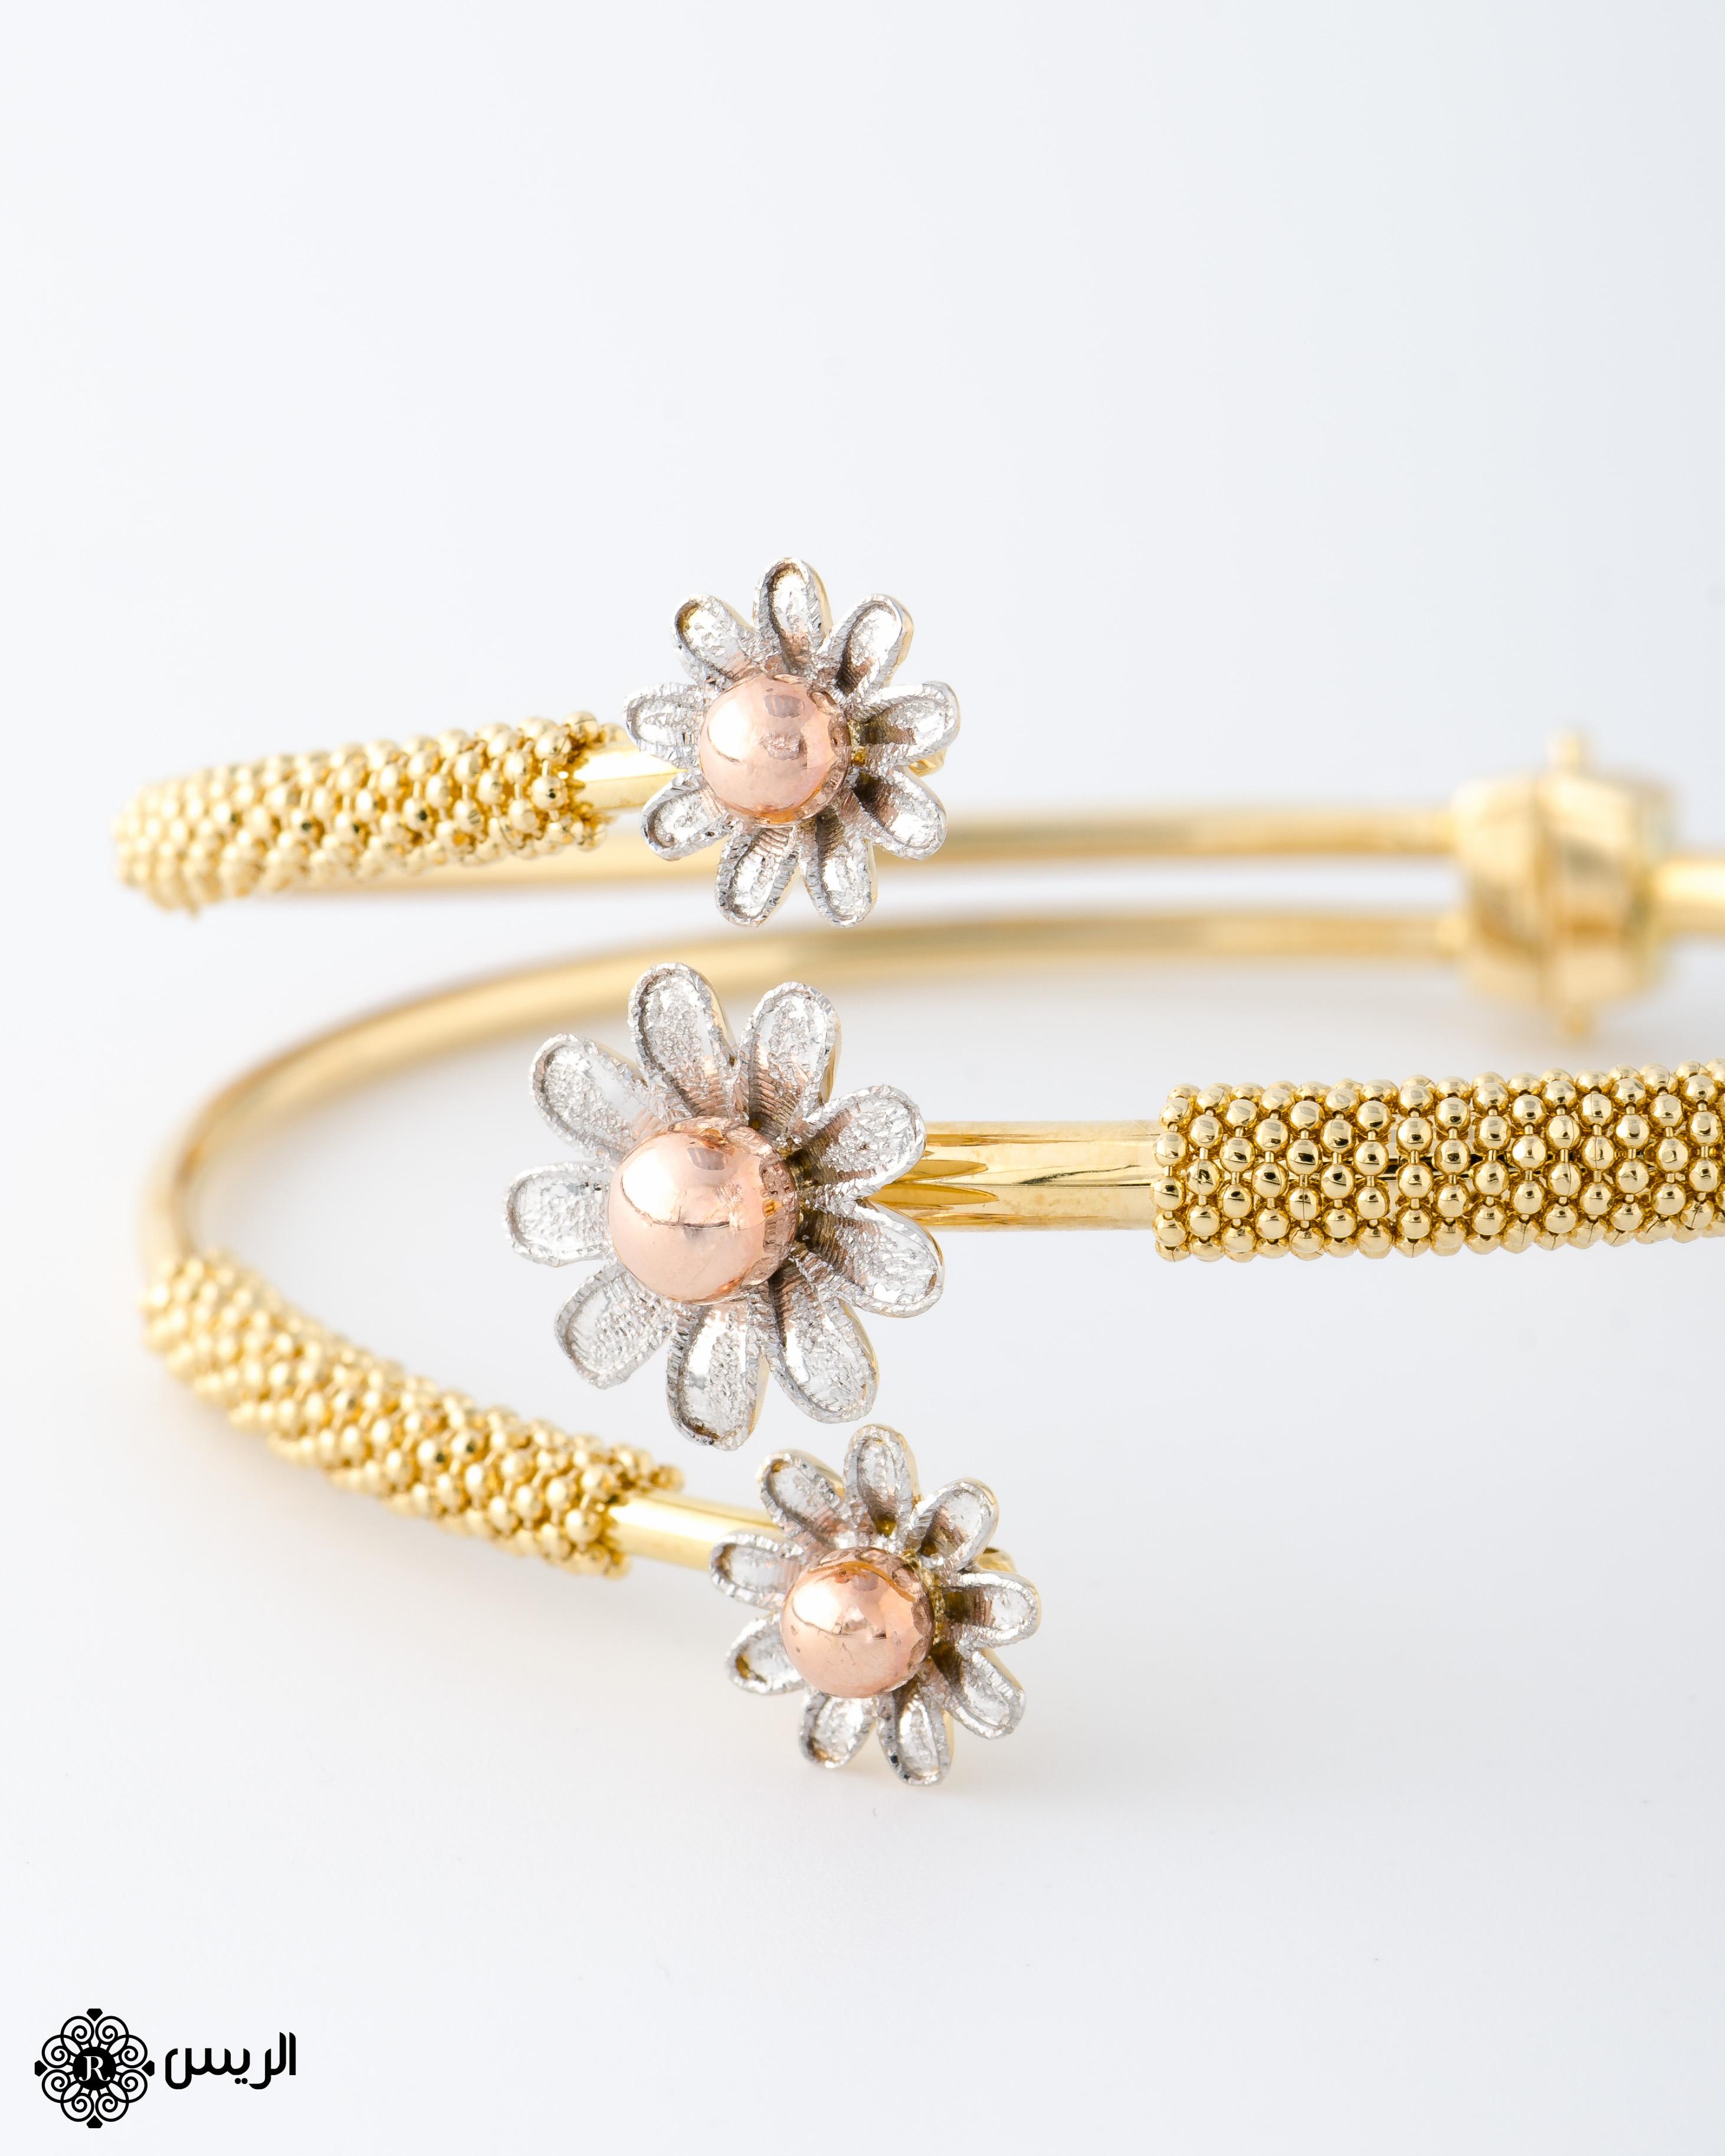 Raies jewelry Bangle Italian Design with Flowers إسورة وردات تصميم إيطالي الريس للمجوهرات